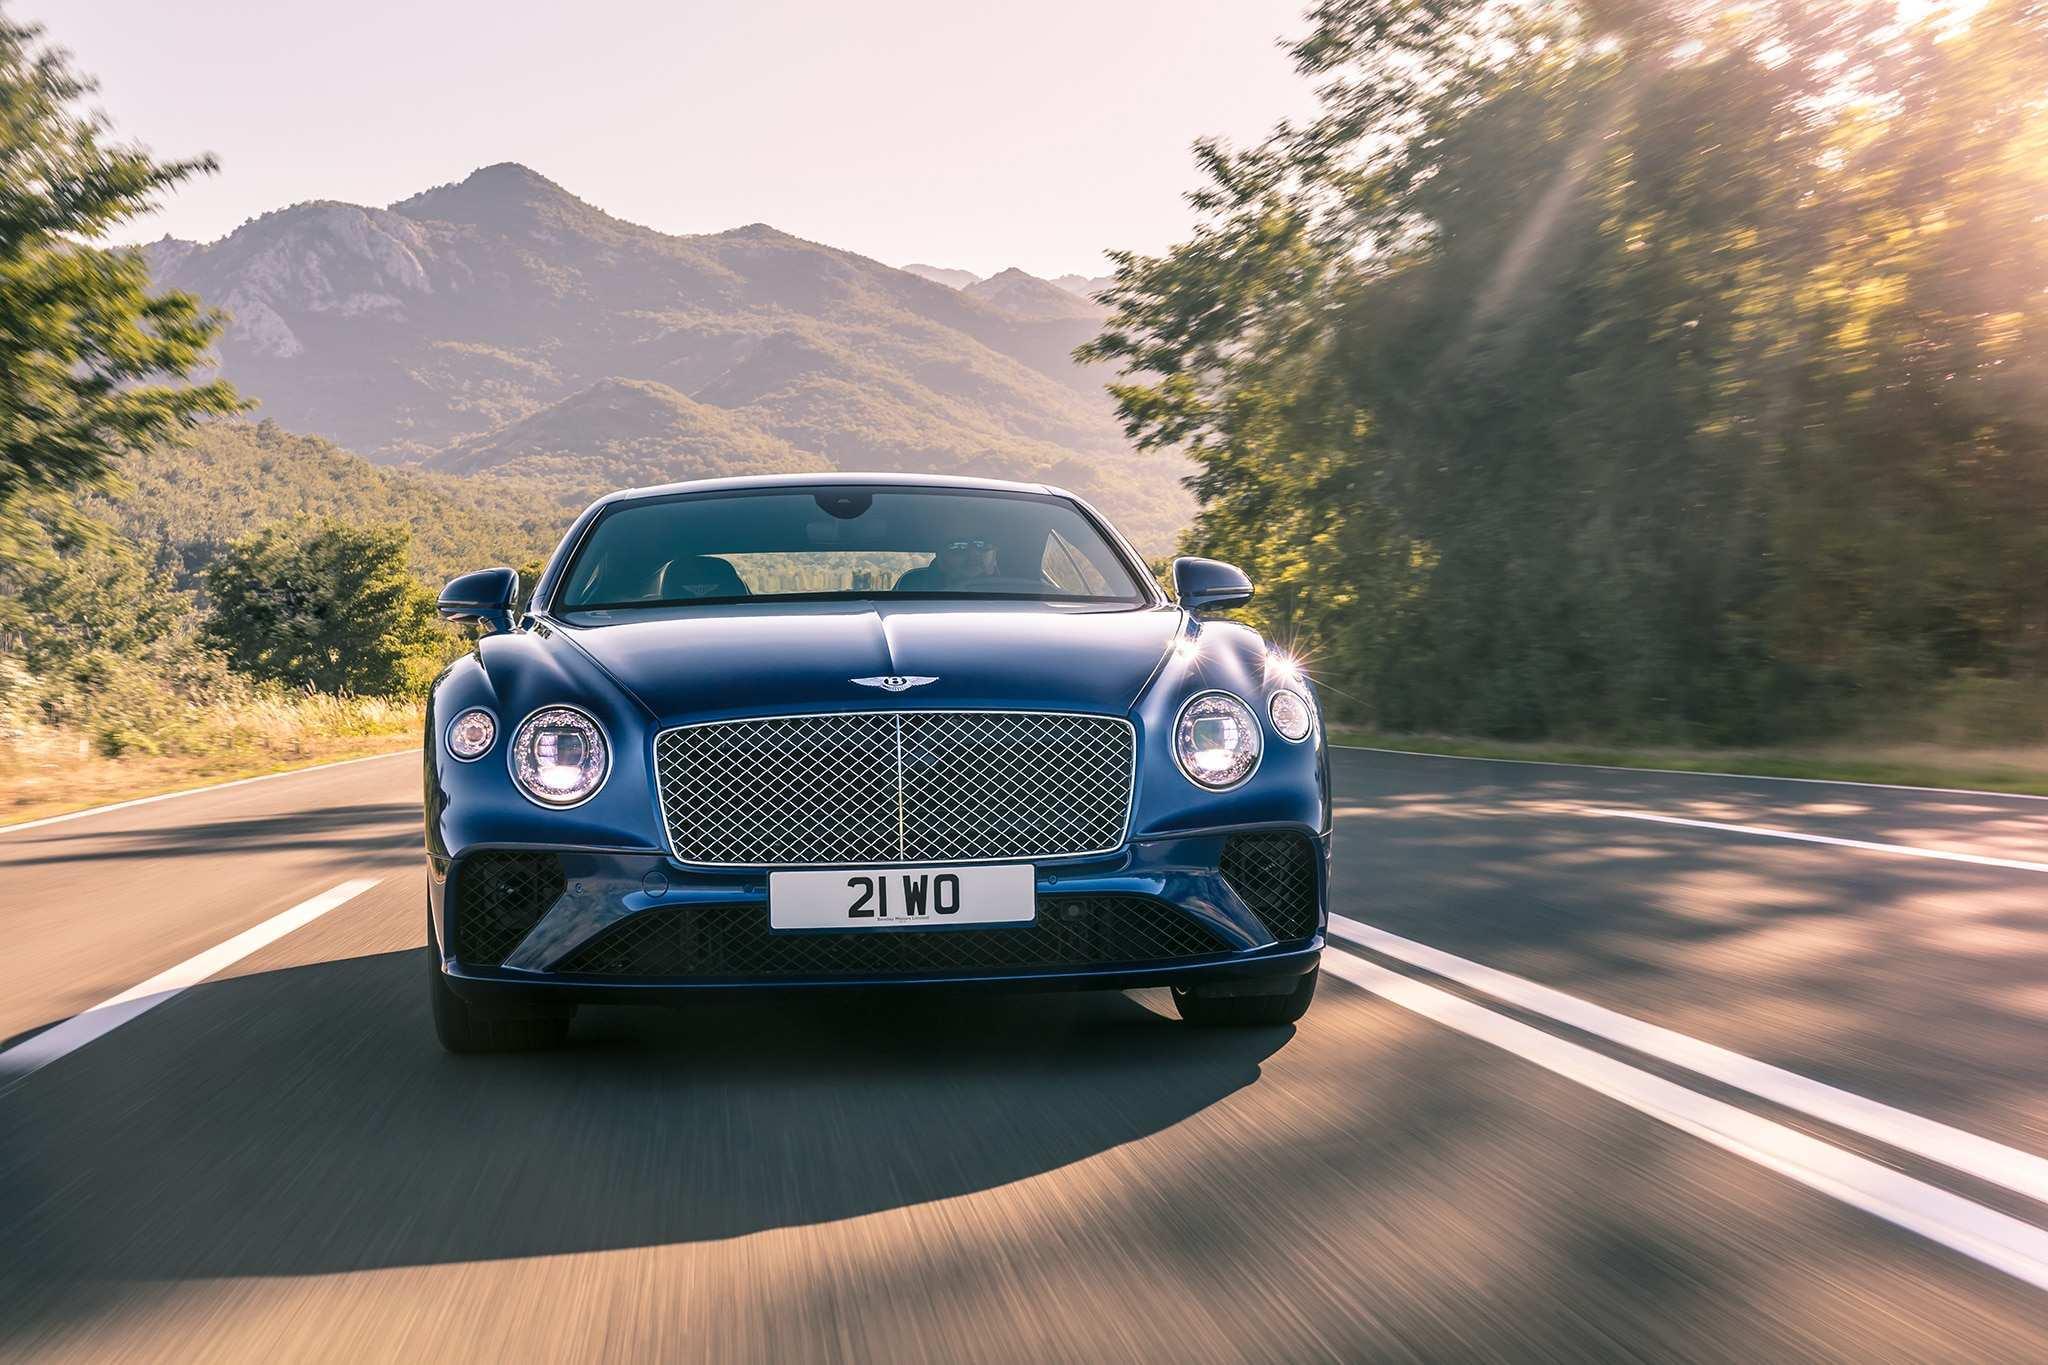 82 Best Review 2019 Bentley Continental Gt Weight Spesification by 2019 Bentley Continental Gt Weight